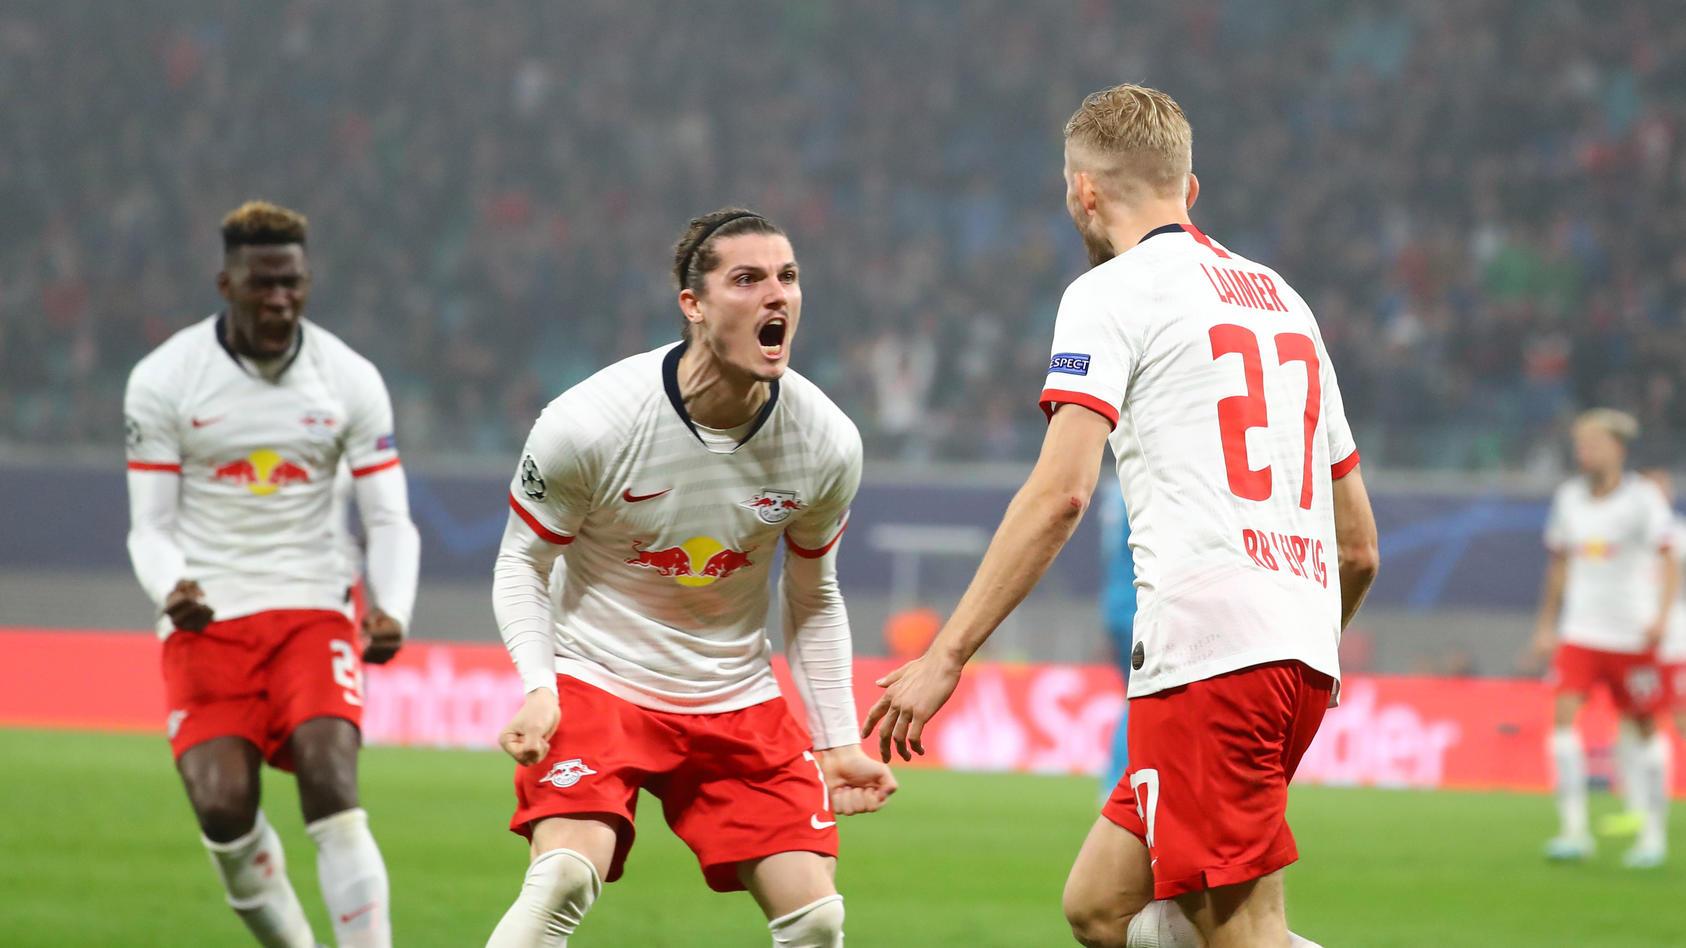 RB Leipzig - St.Petersburg / Fussball Champions League Leipzig, 23.10.2019, Red Bull Arena, UEFA Champions league , RB